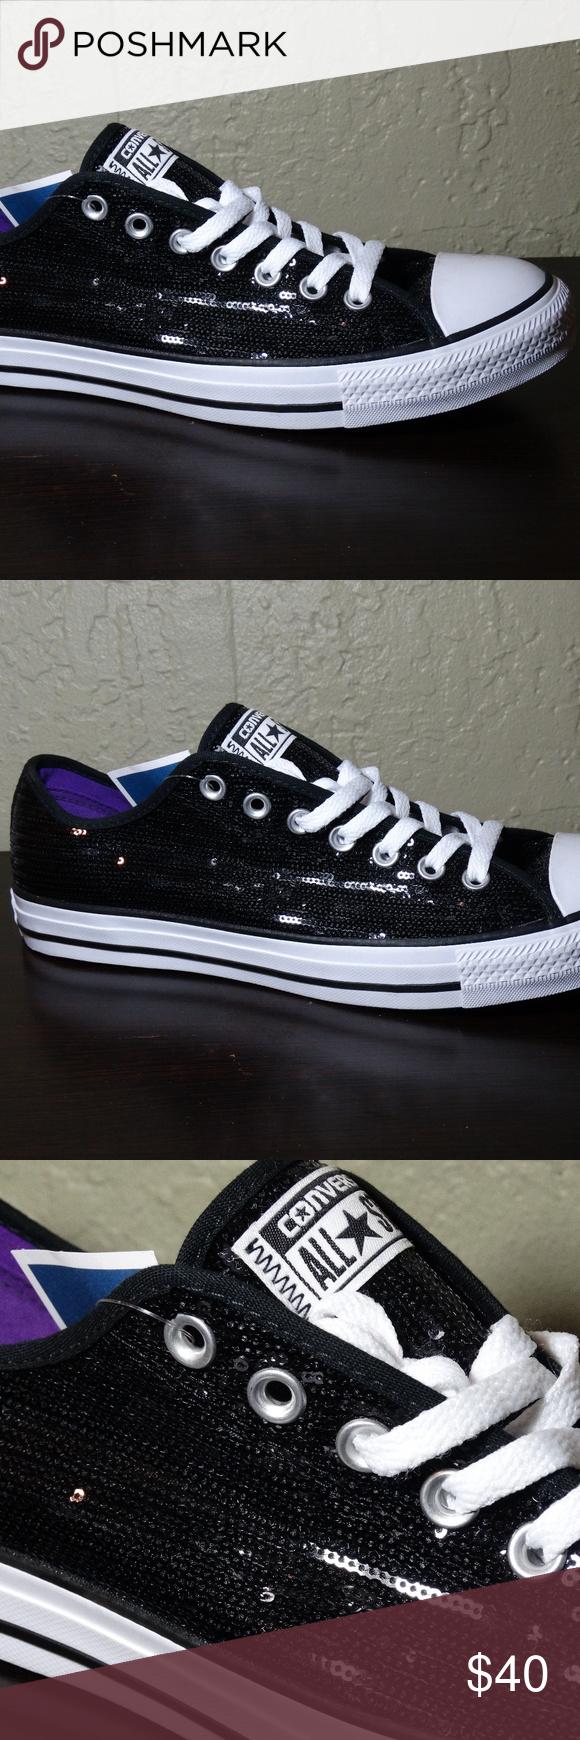 6202f3a39396ed CONVERSE ALL STARS Black Sequins Sneakers Size 12 Black Sequins Sneakers  Made by ConvWerse All Stars Men s size 10 Women s Size 12 New with tags